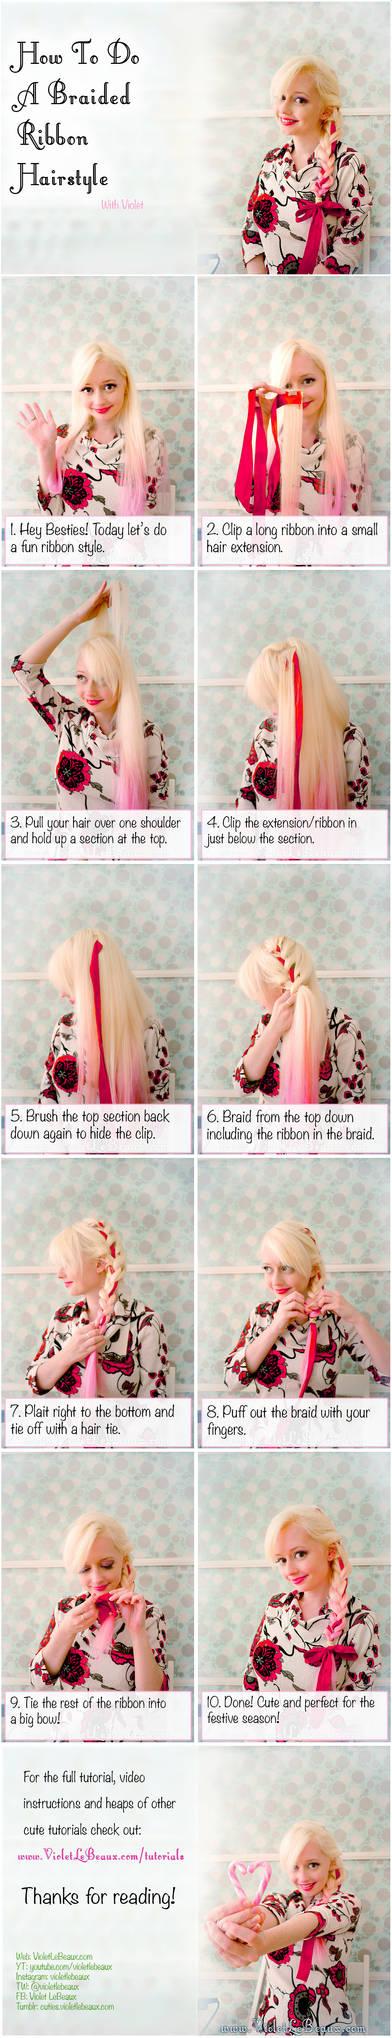 Holiday Ribbon Braid Hairstyle Tutorial